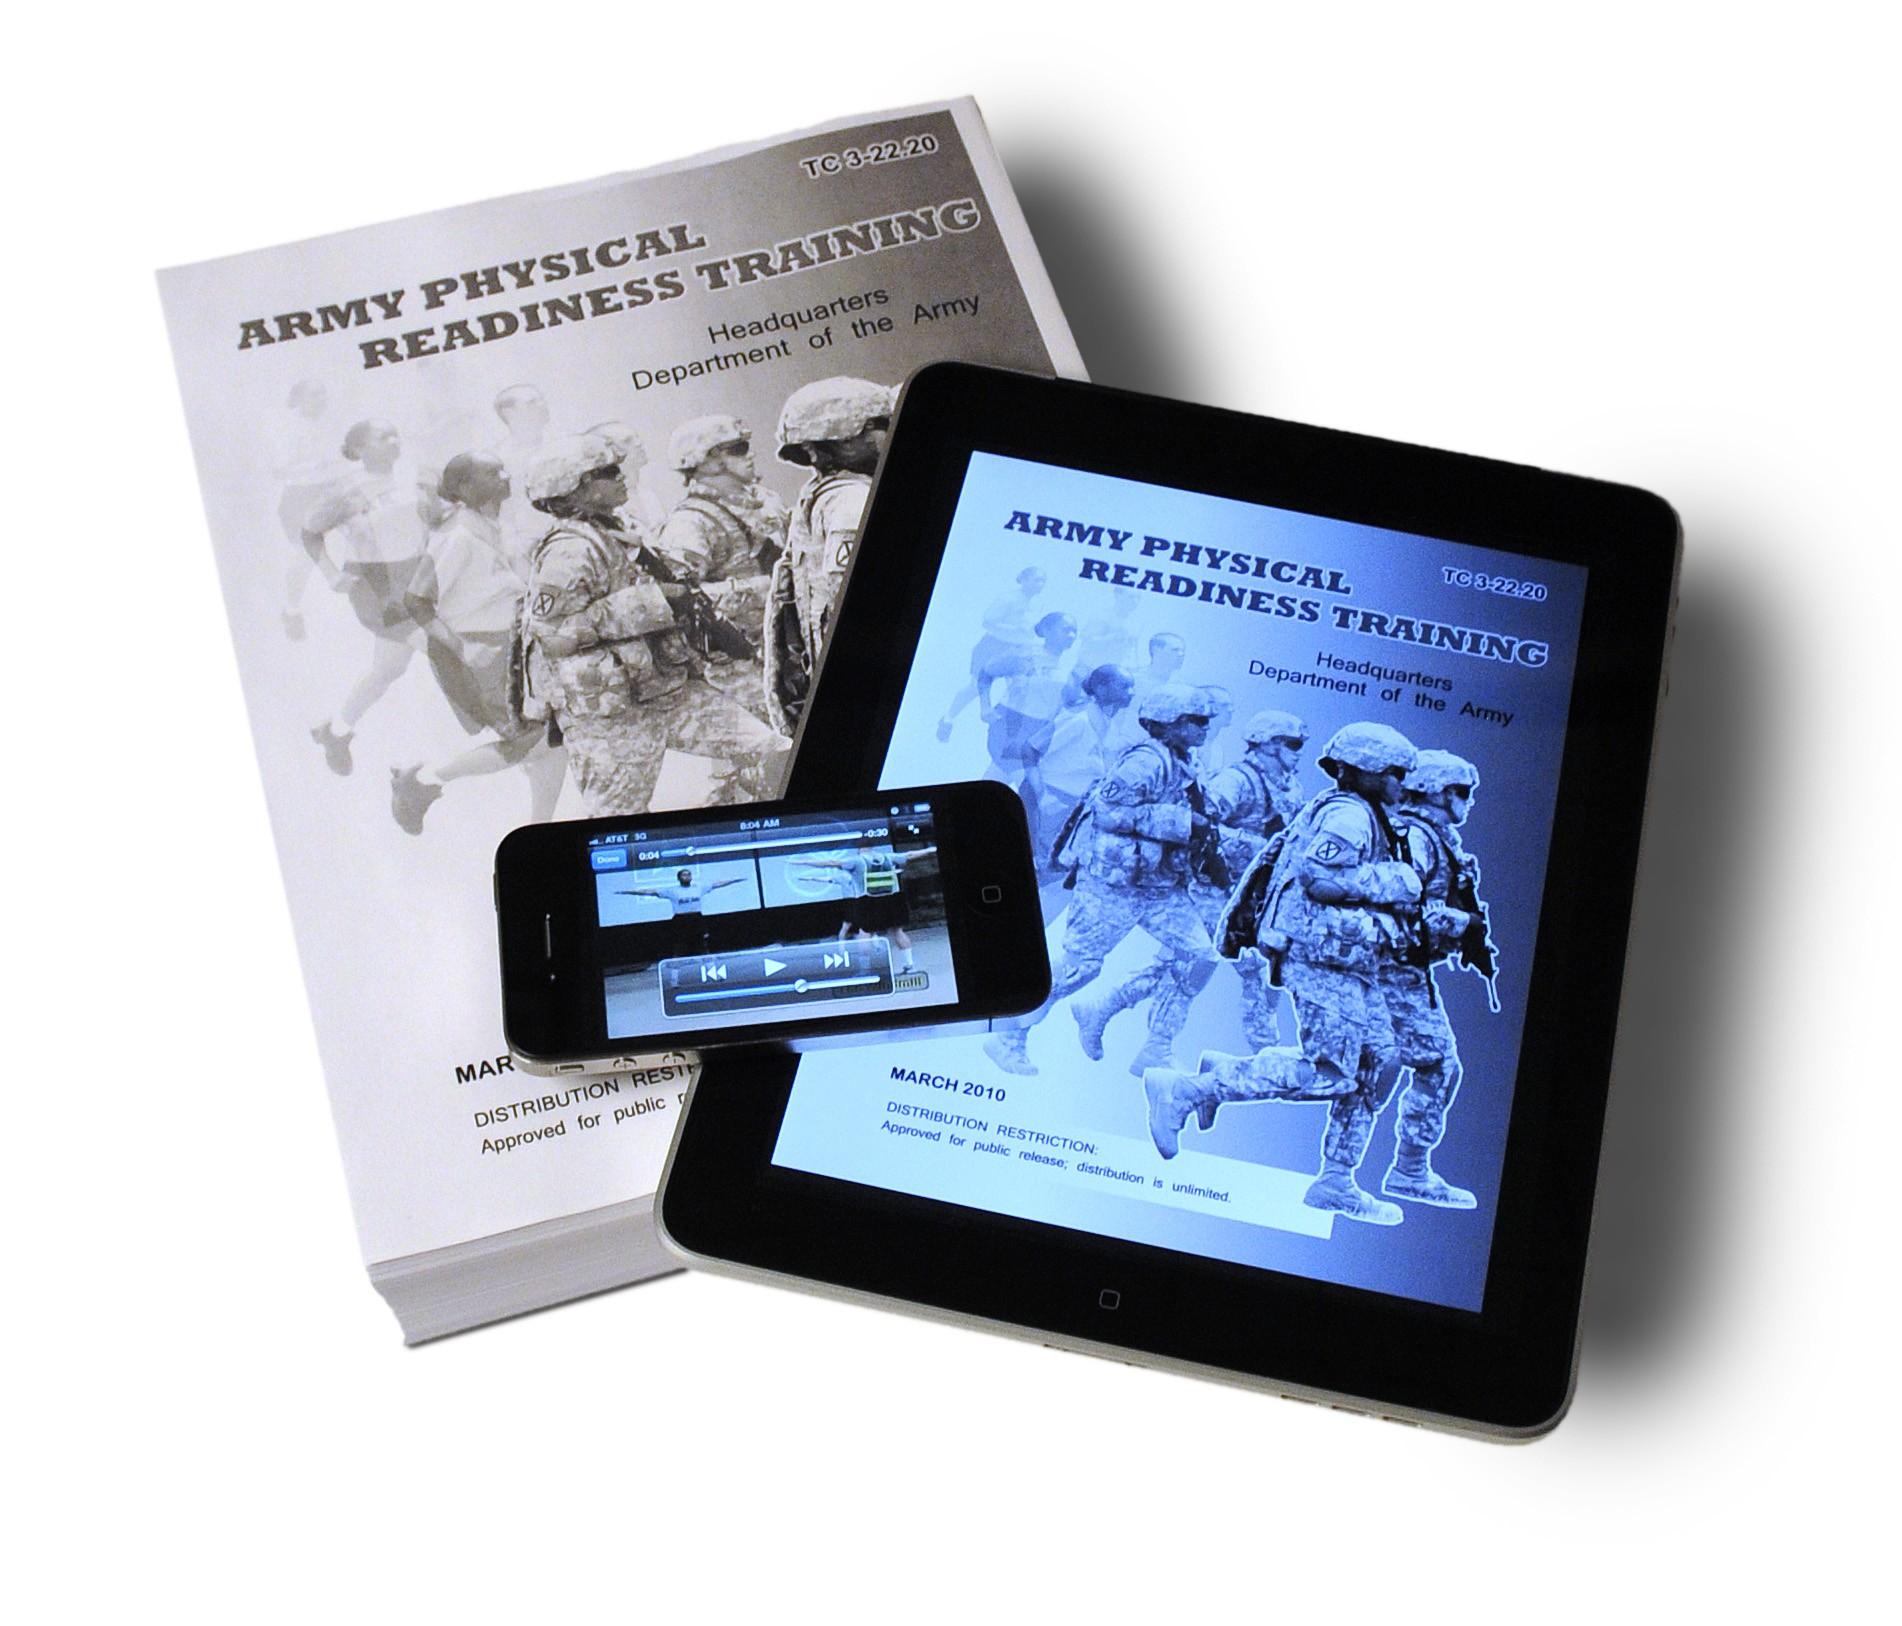 Army Prt Manual Tc 3-22.20 Epub Download